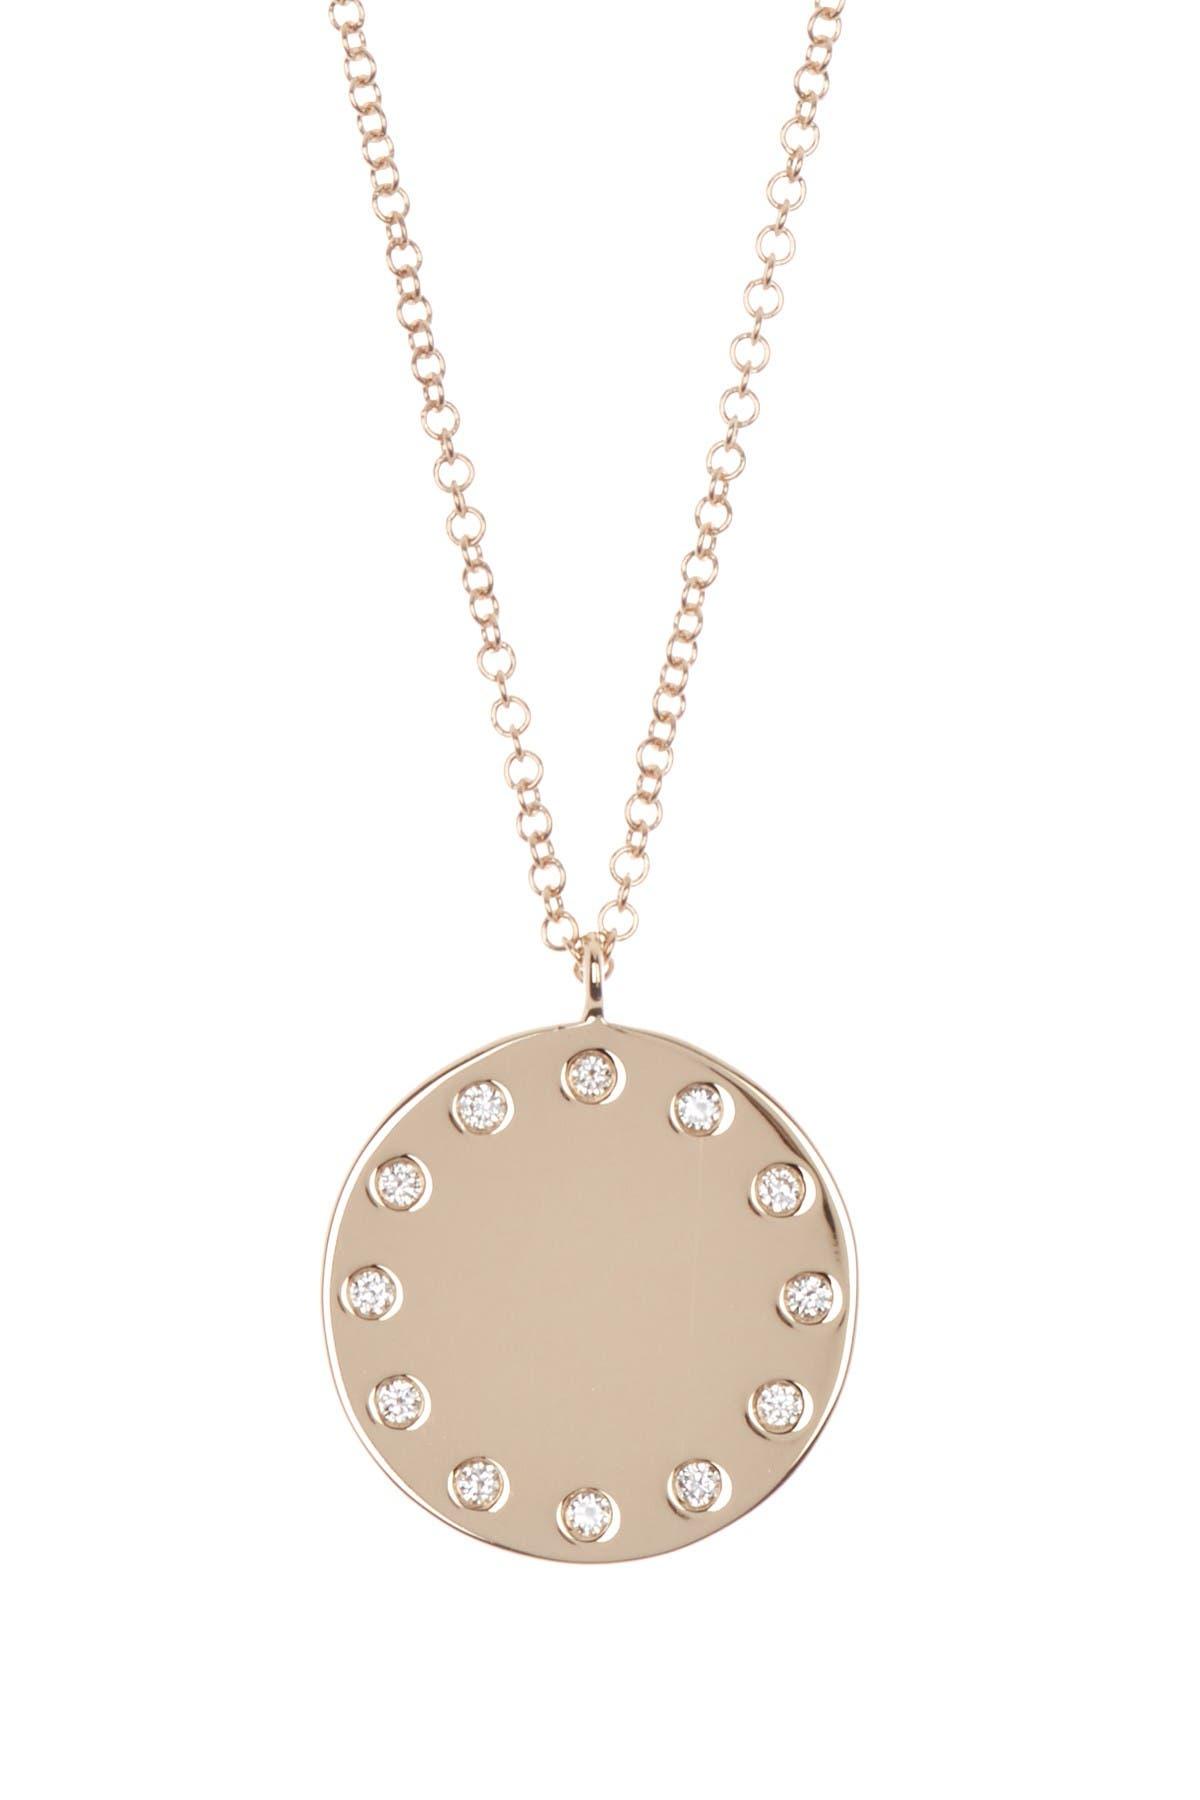 Image of Ron Hami 14K Gold Diamond Disc Pendant Necklace - 0.09 ctw